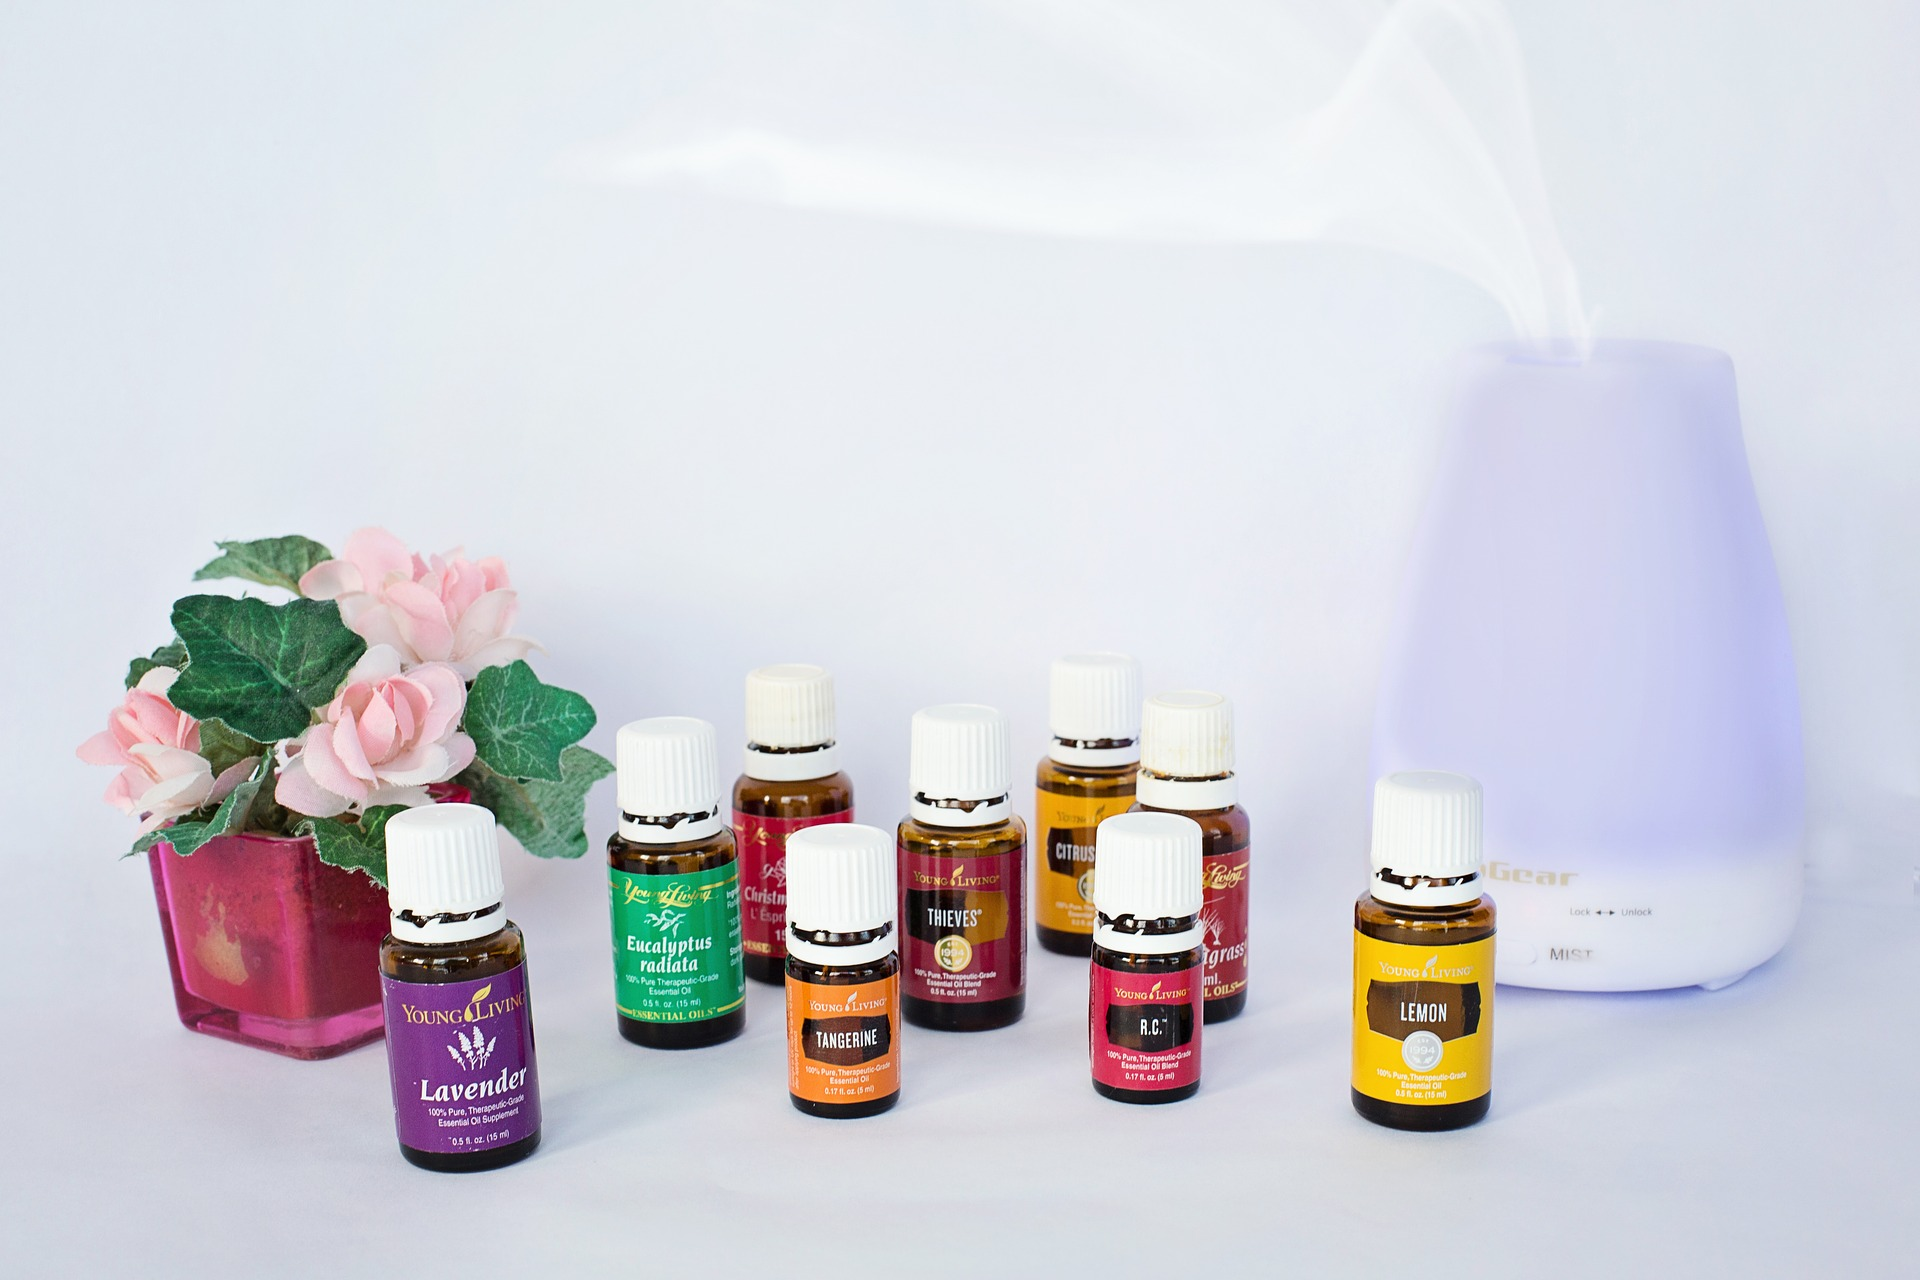 essential-oils-1958549_1920.jpg